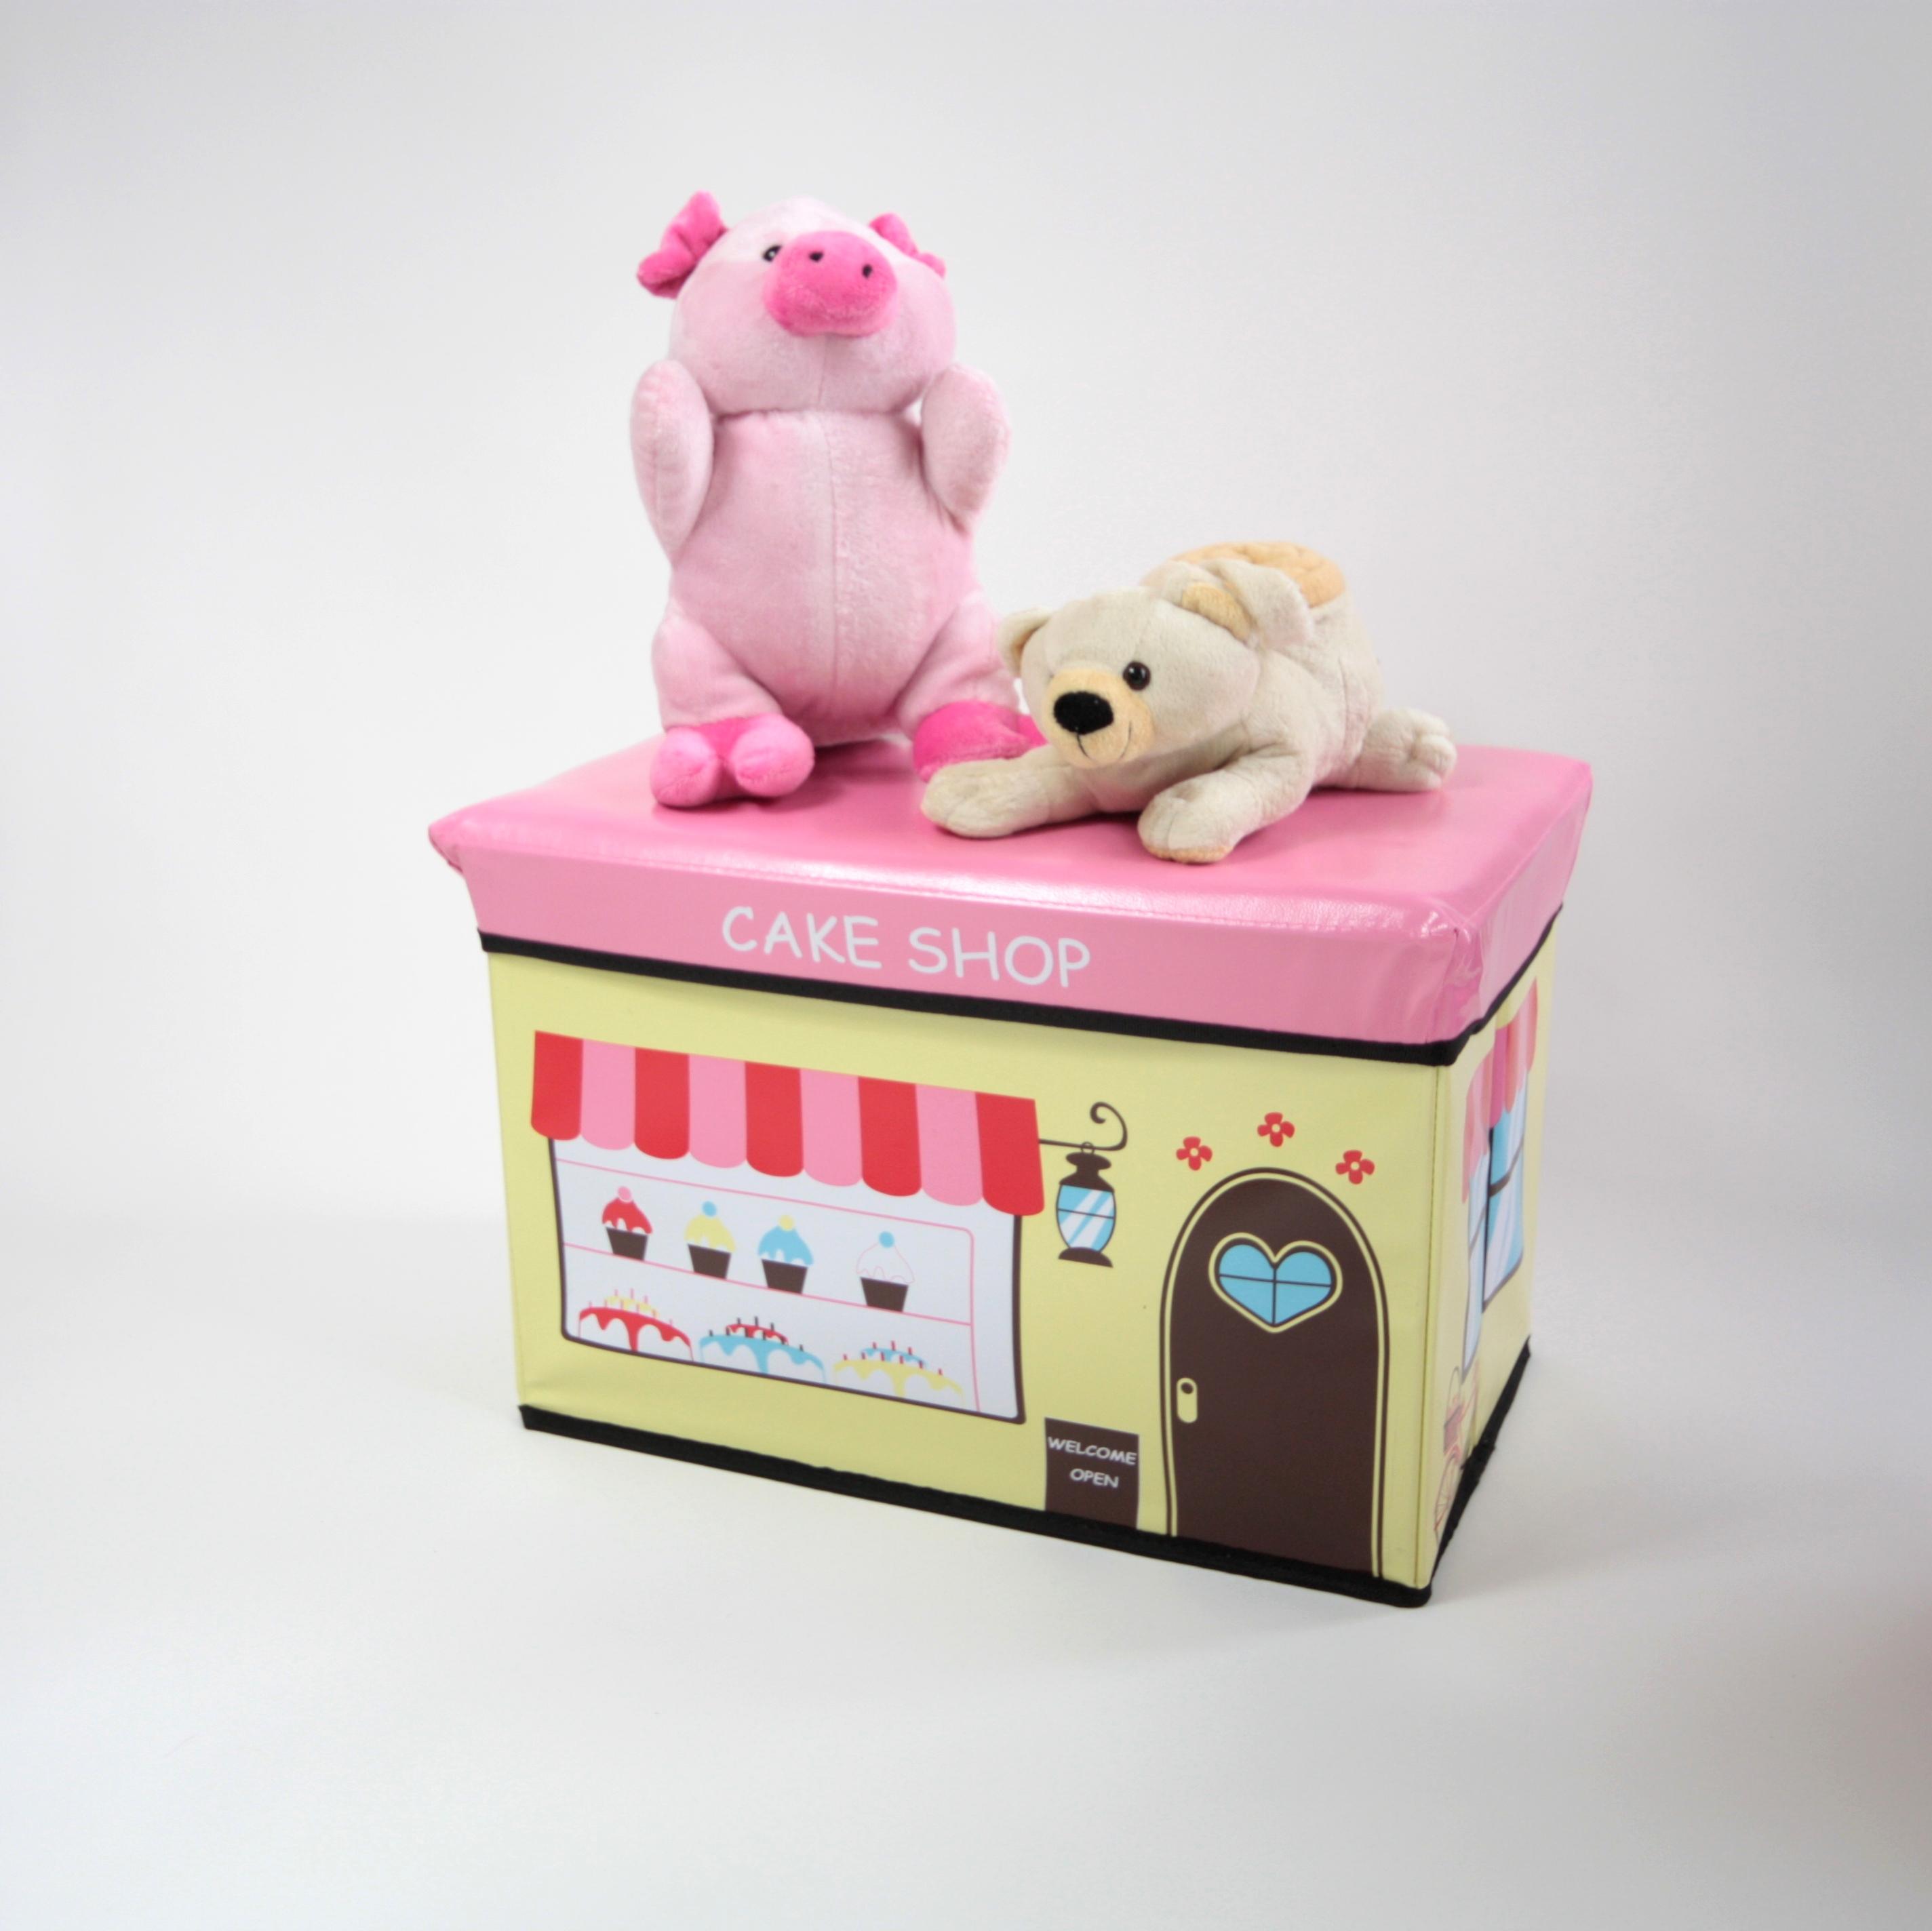 Pufa Cake Shop